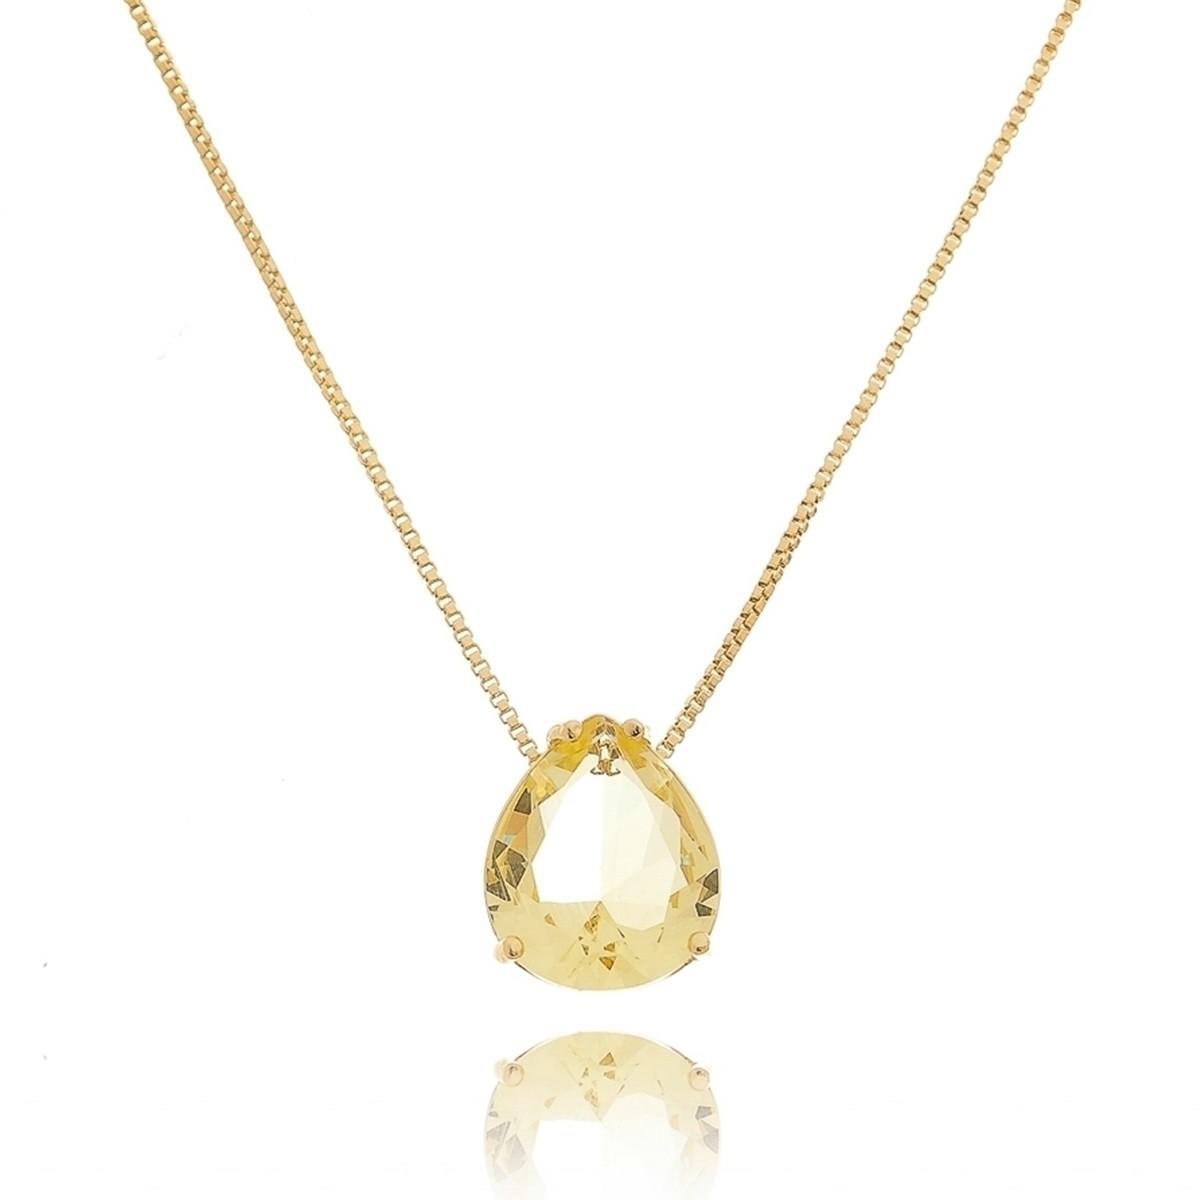 Colar Gota Zircônia Fancy Yellow 11 x13 mm Semijoia de Luxo em Ouro 18K  - Soloyou